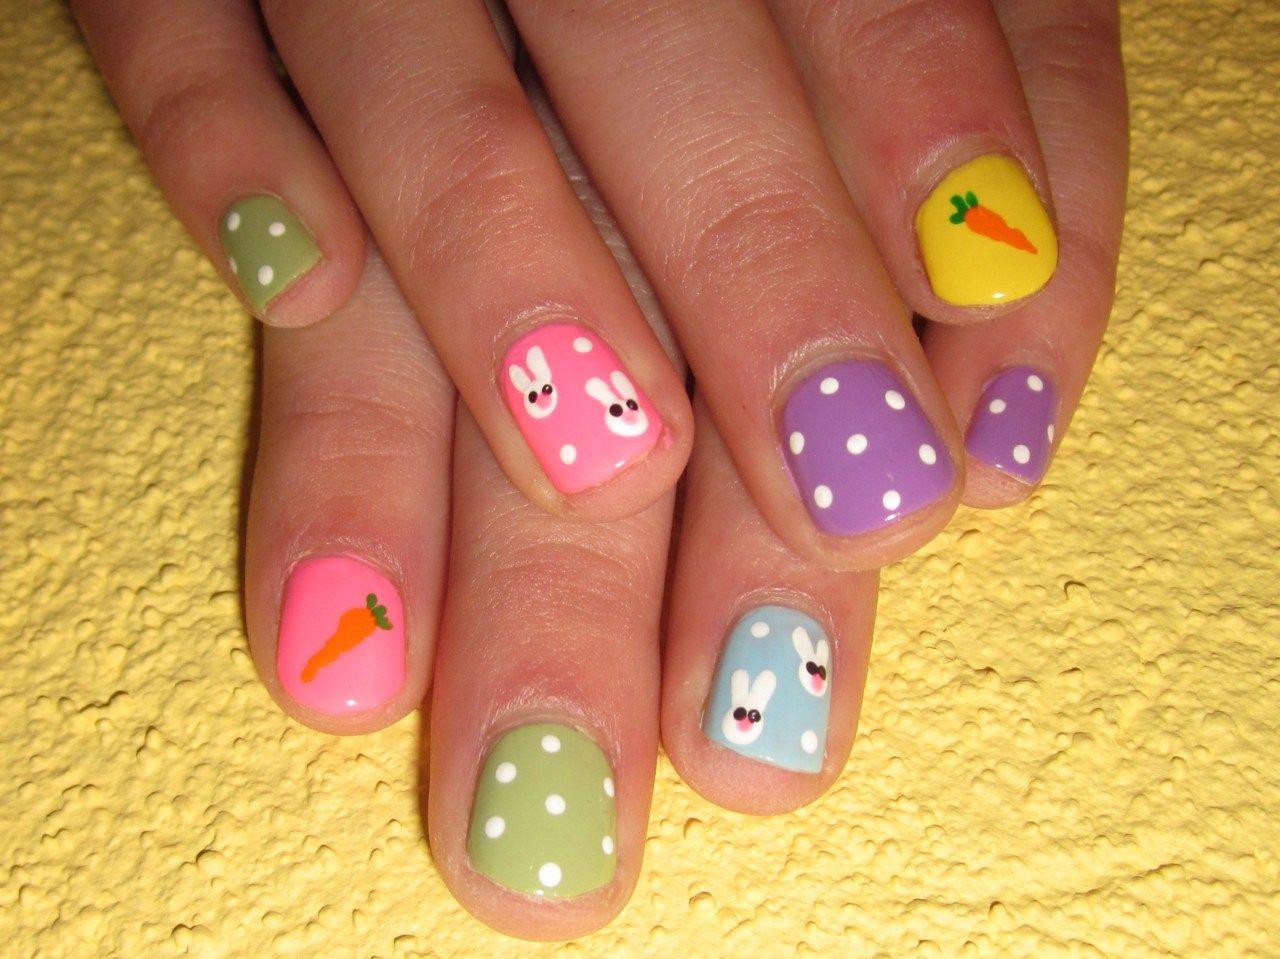 easter nail art | Tumblr | nails | Pinterest | Easter nail art ...